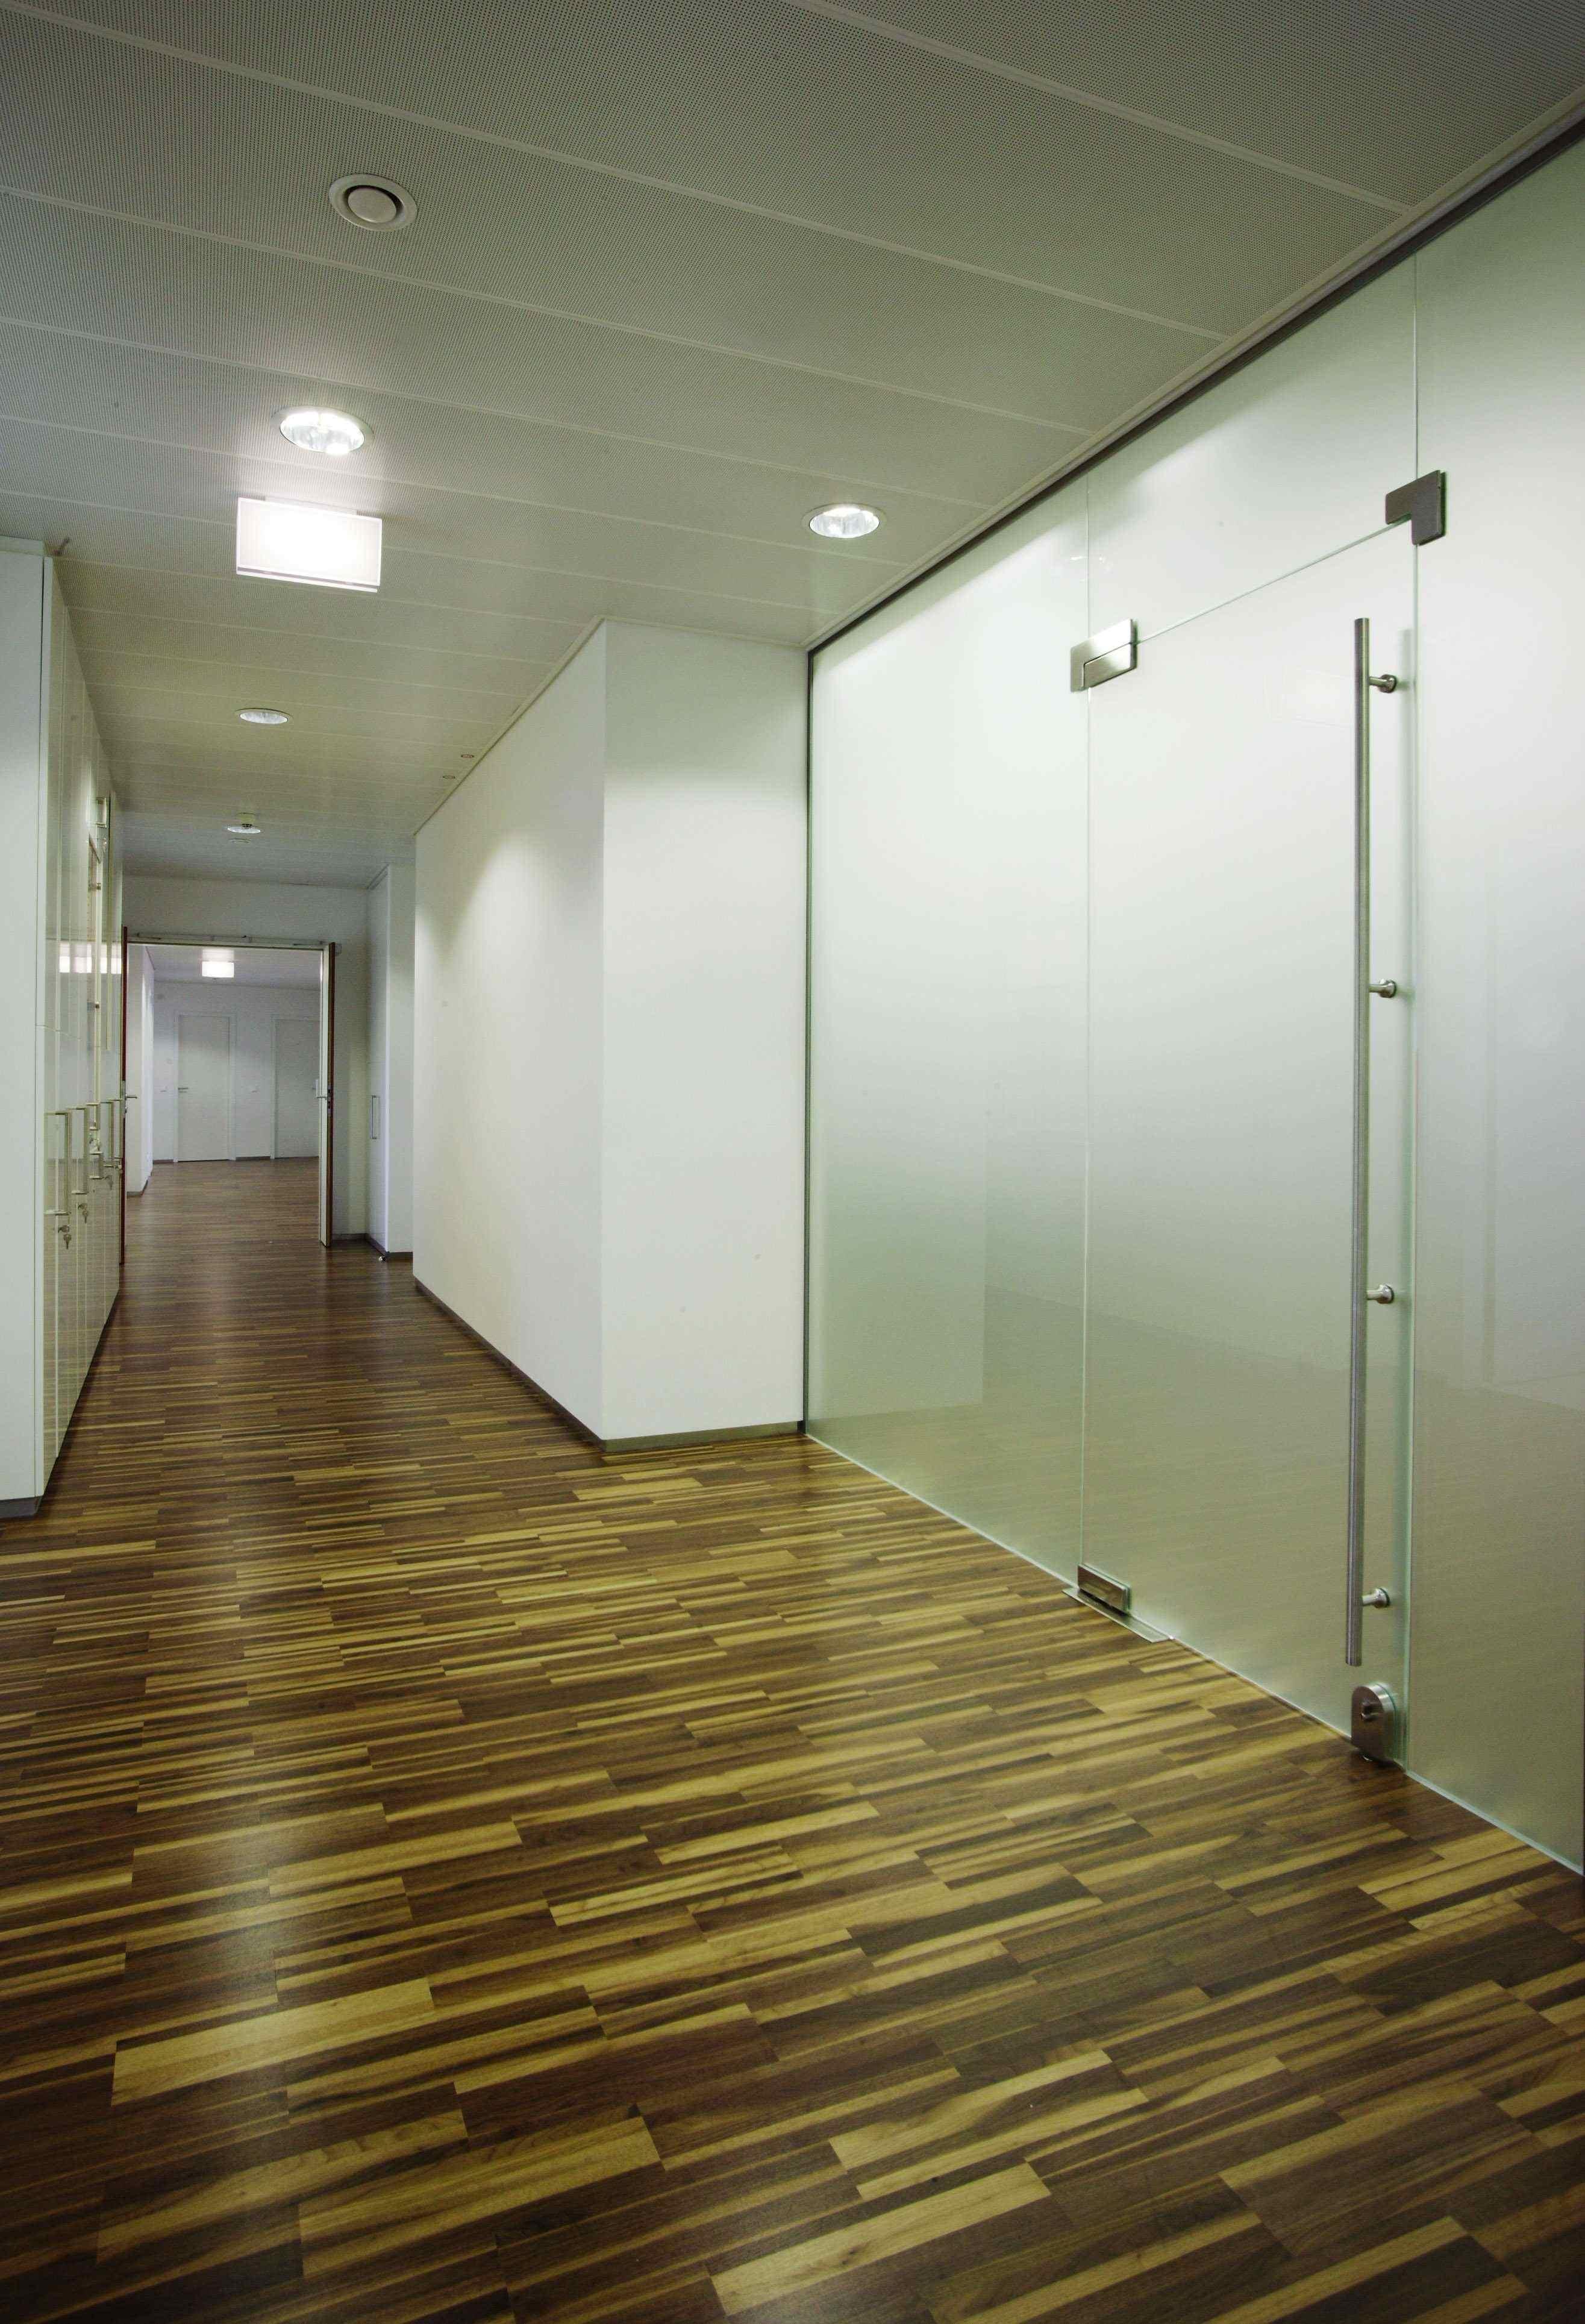 Gang in der Care Acydemy, designed von Studio Thörnblom